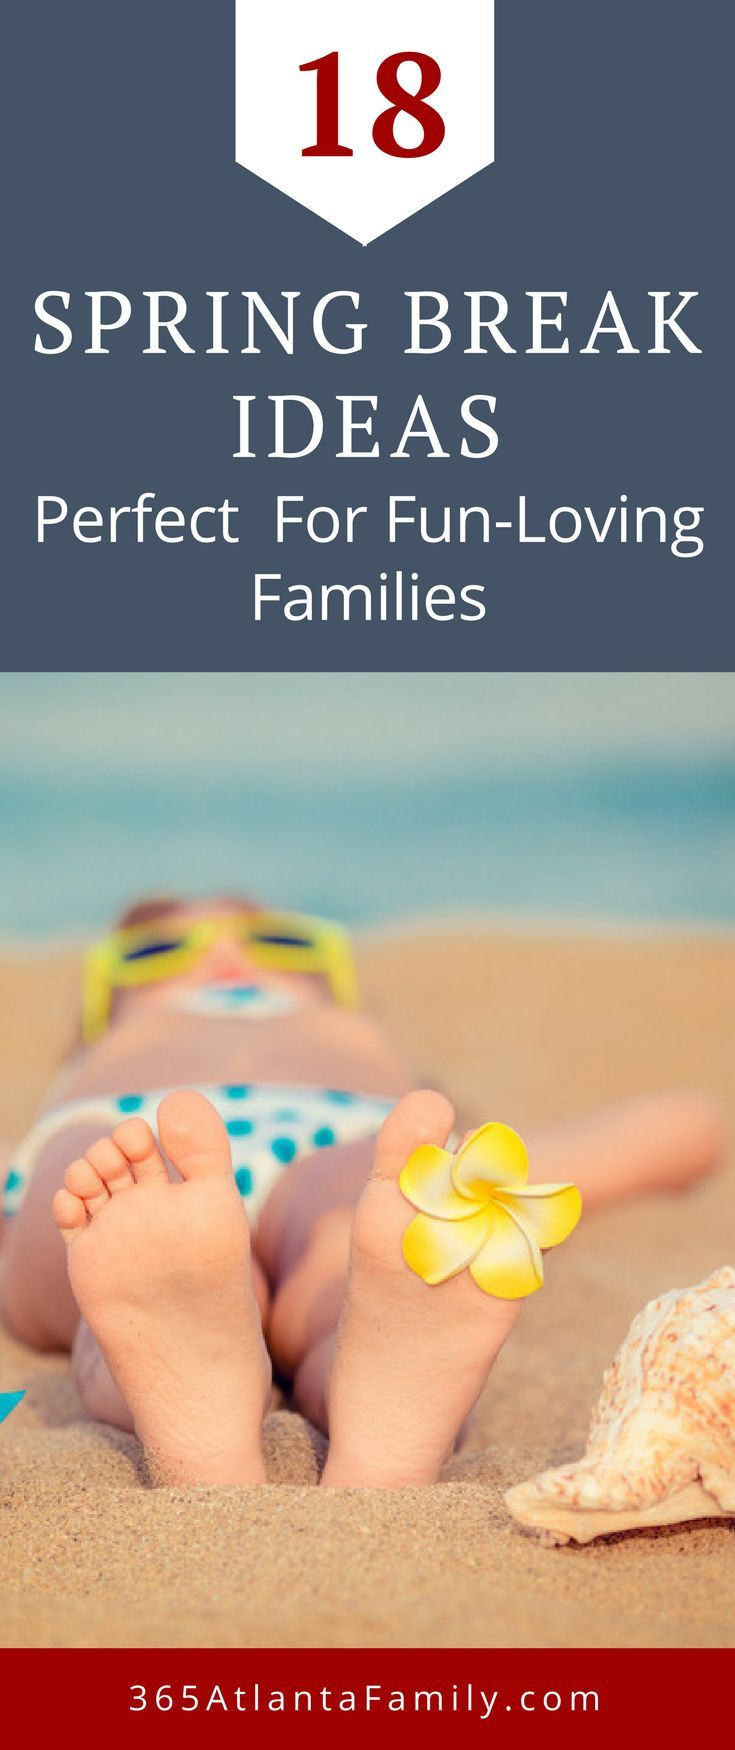 Spring Break 2019 Travel Ideas 17 Perfect Spring Break Ideas For Fun Loving Families In 2019